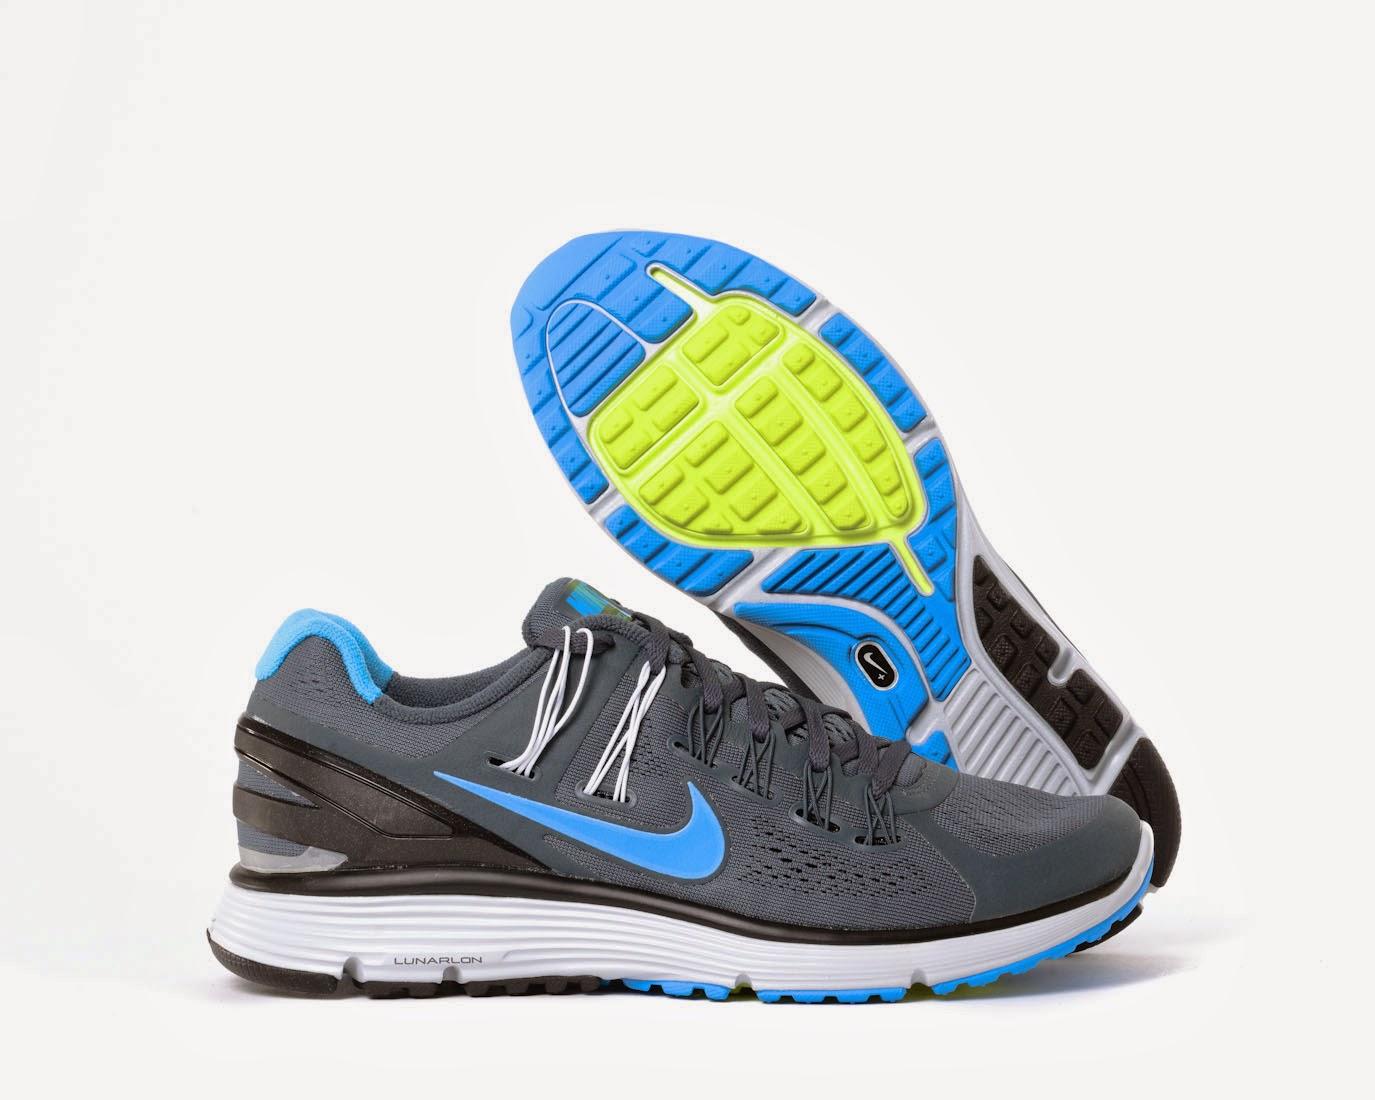 Nike Lunareclipse+ 3